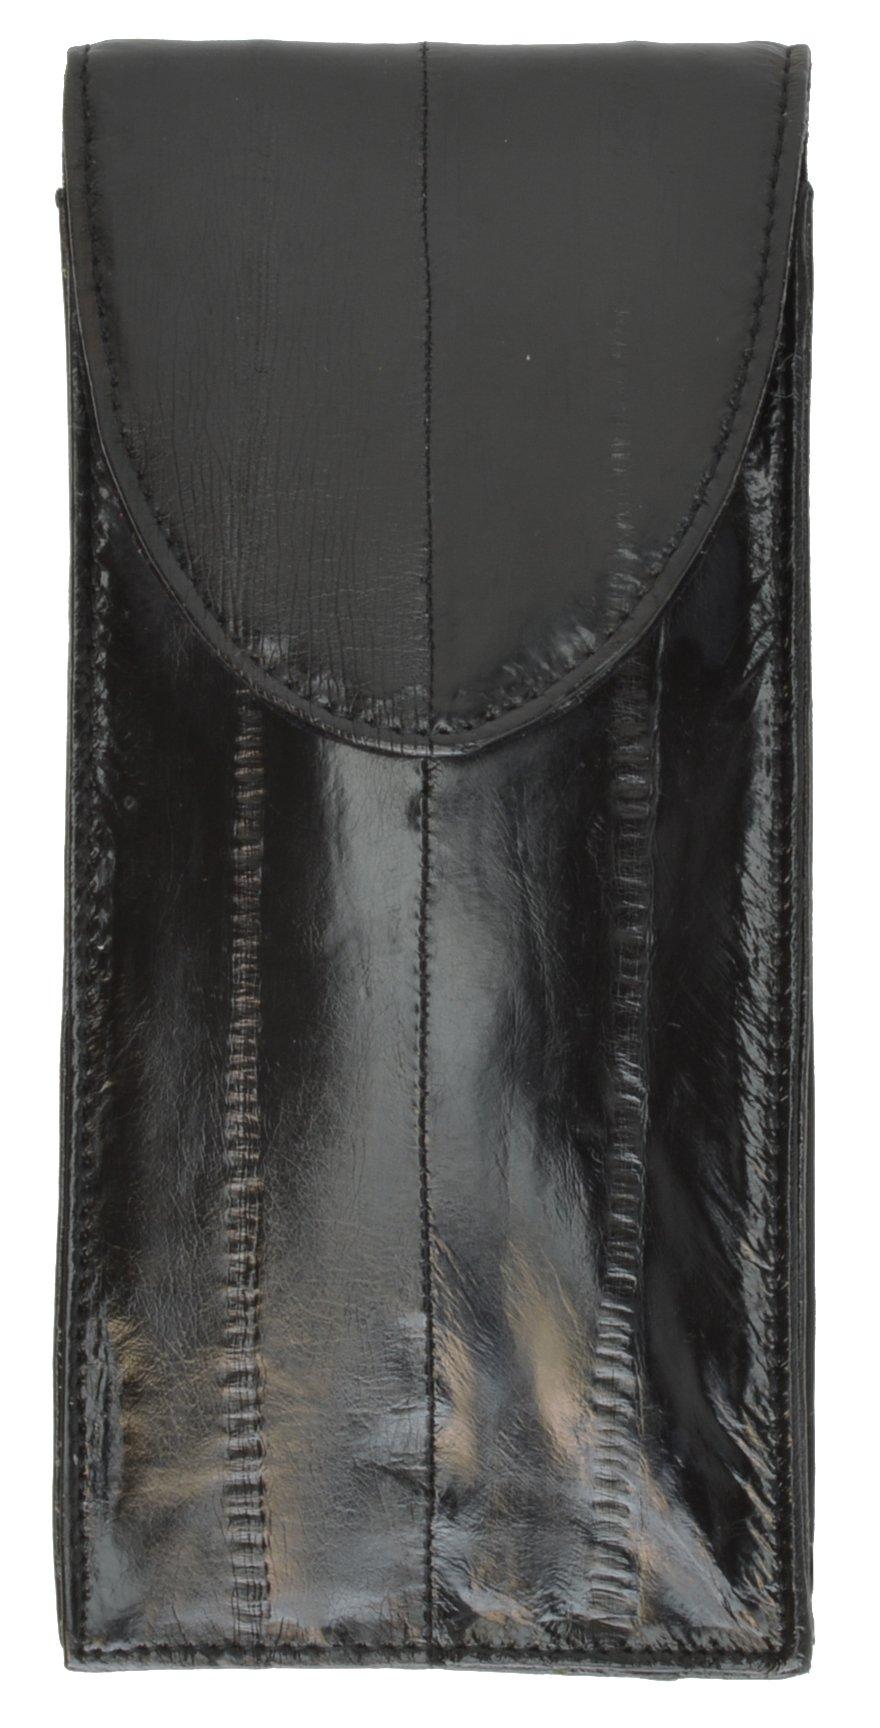 Genuine Eelskin Soft Leather Eyeglass Holder Case by Marshal